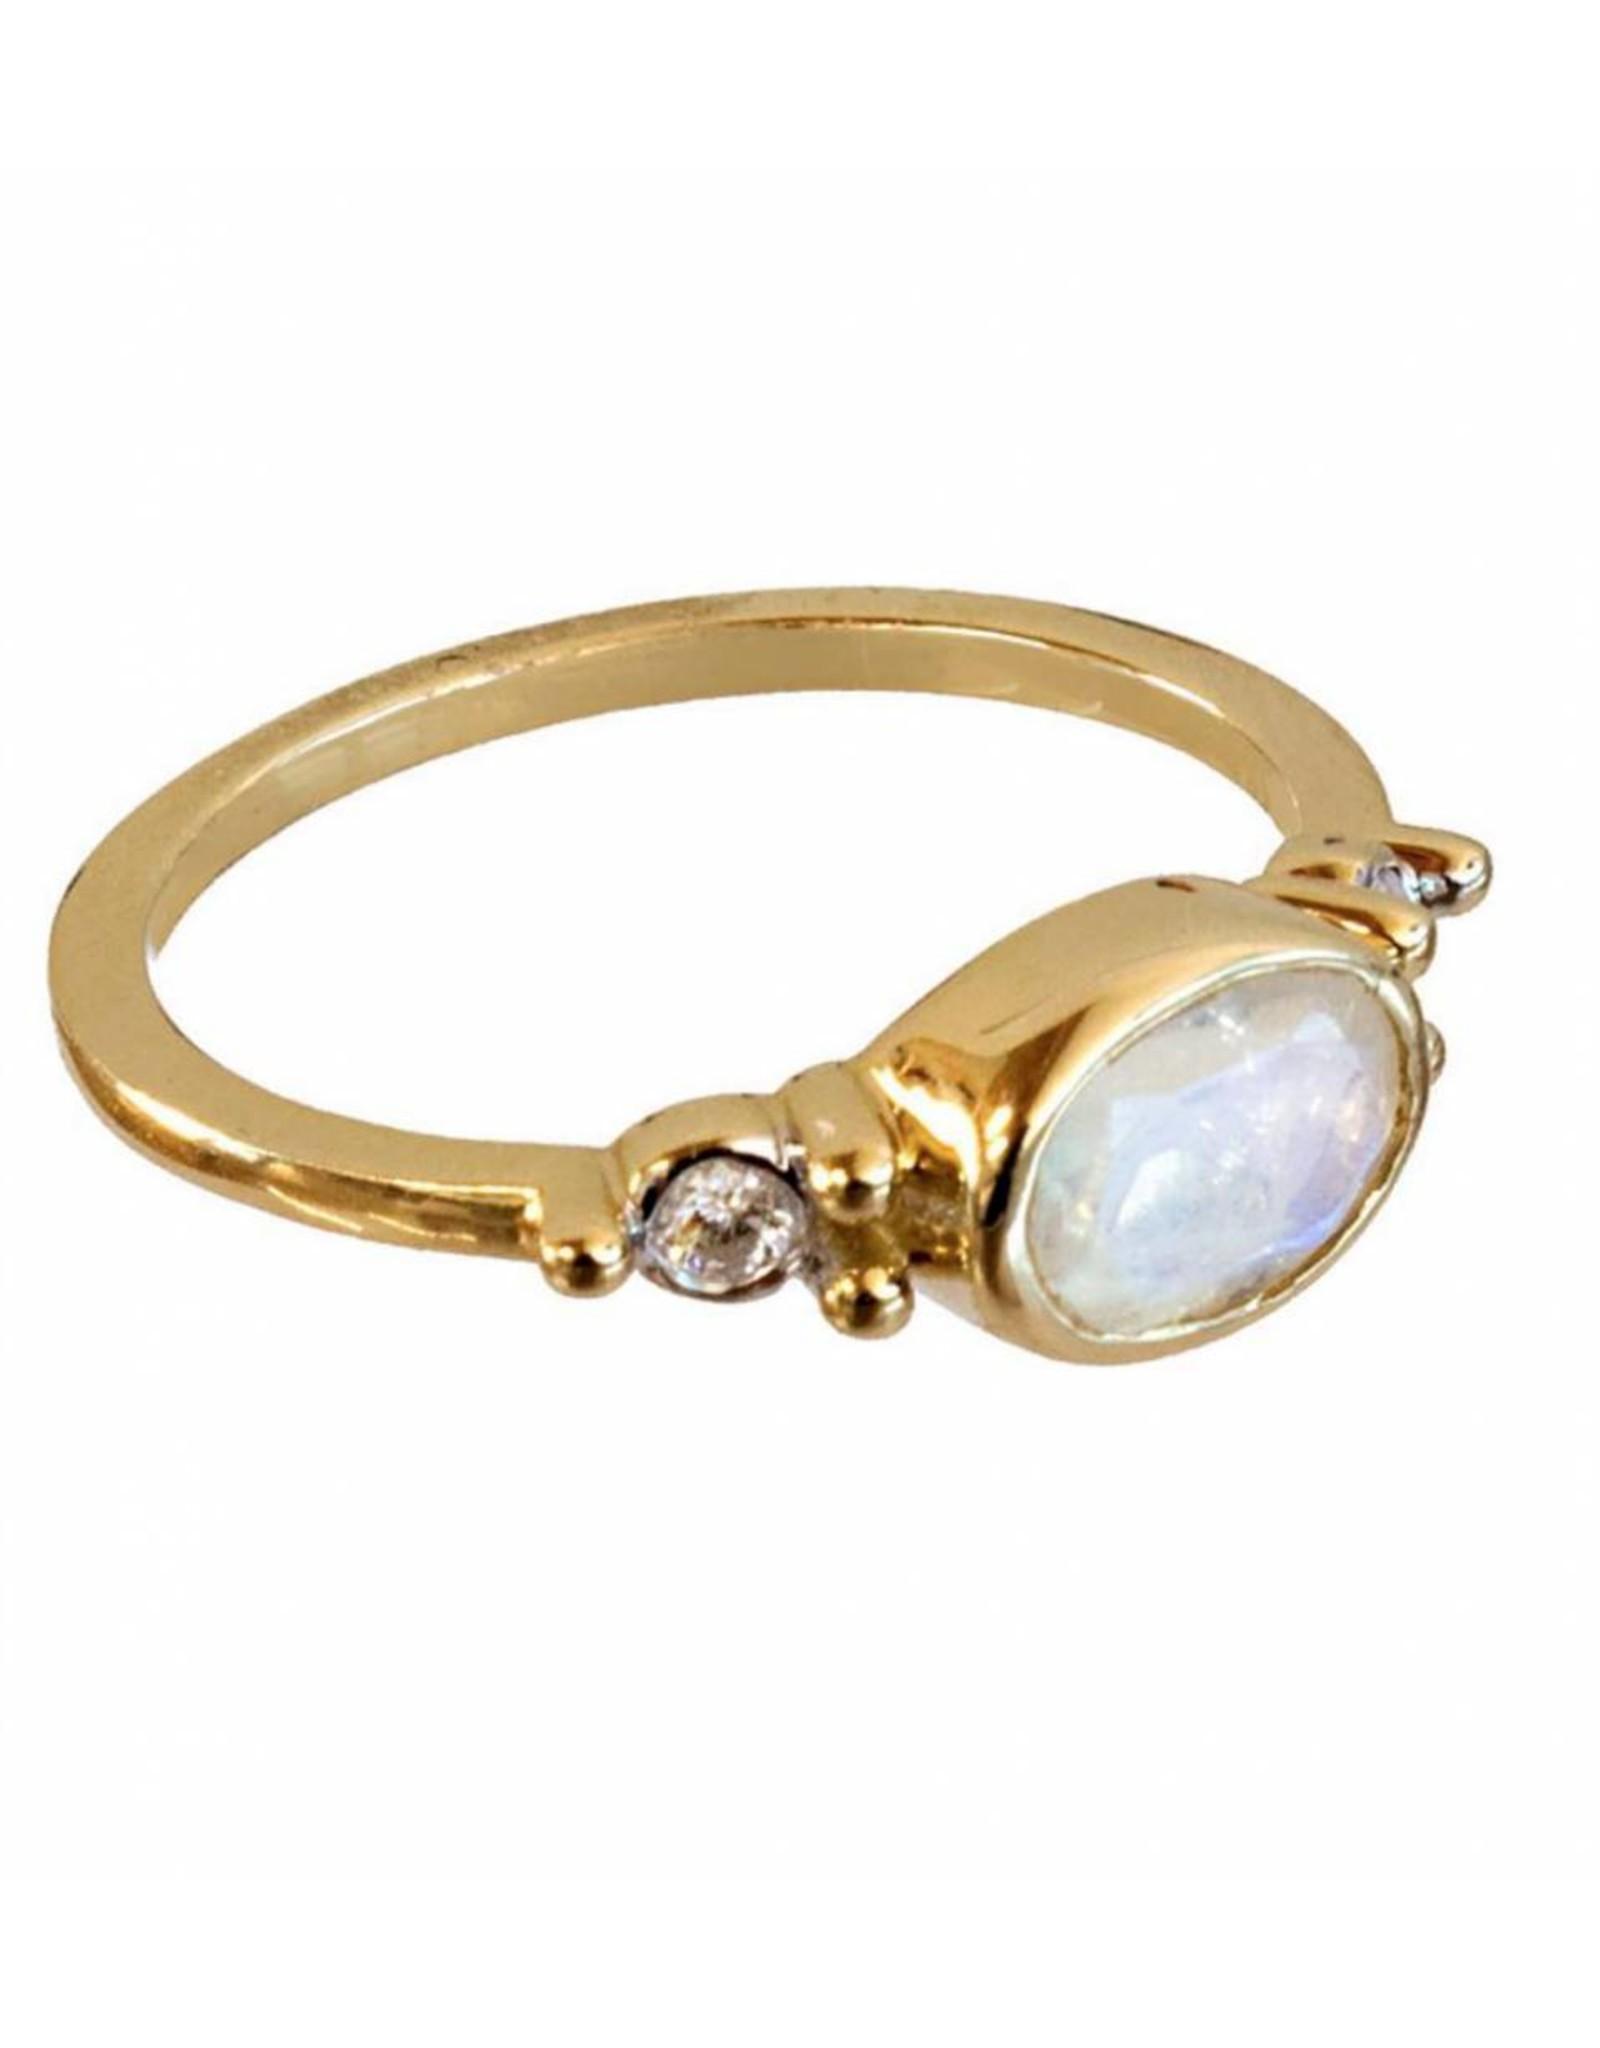 Bo Gold Ring - Gold - Moonstone - Diamond